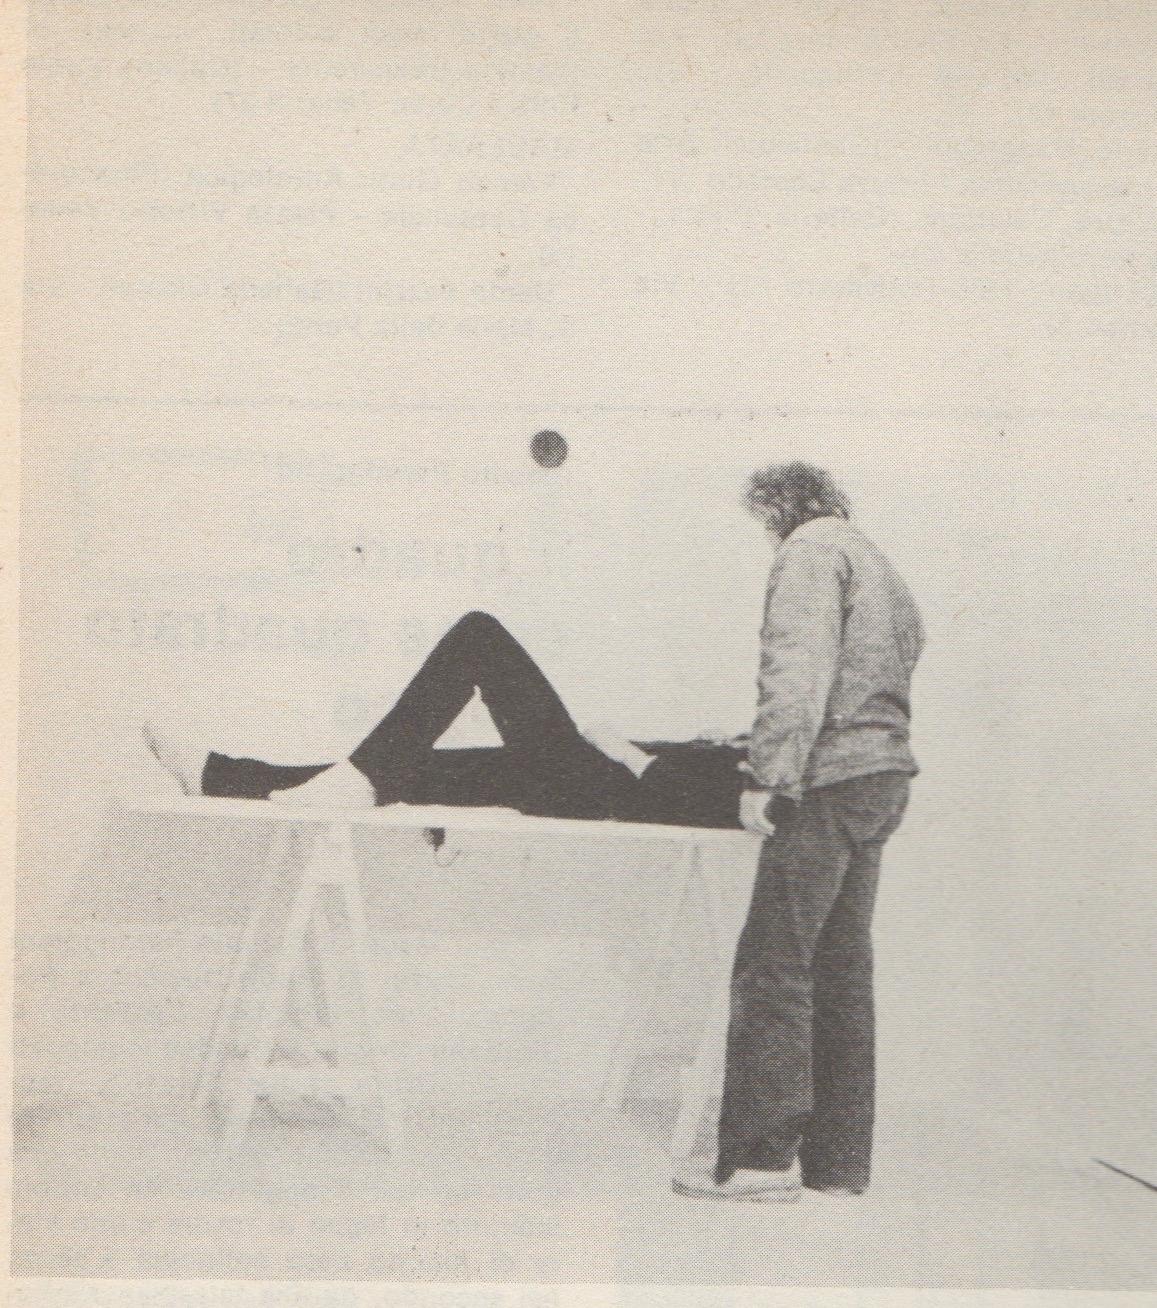 Eliseo Mattiacci, Studio Cesare Manzo, Pescara 1978